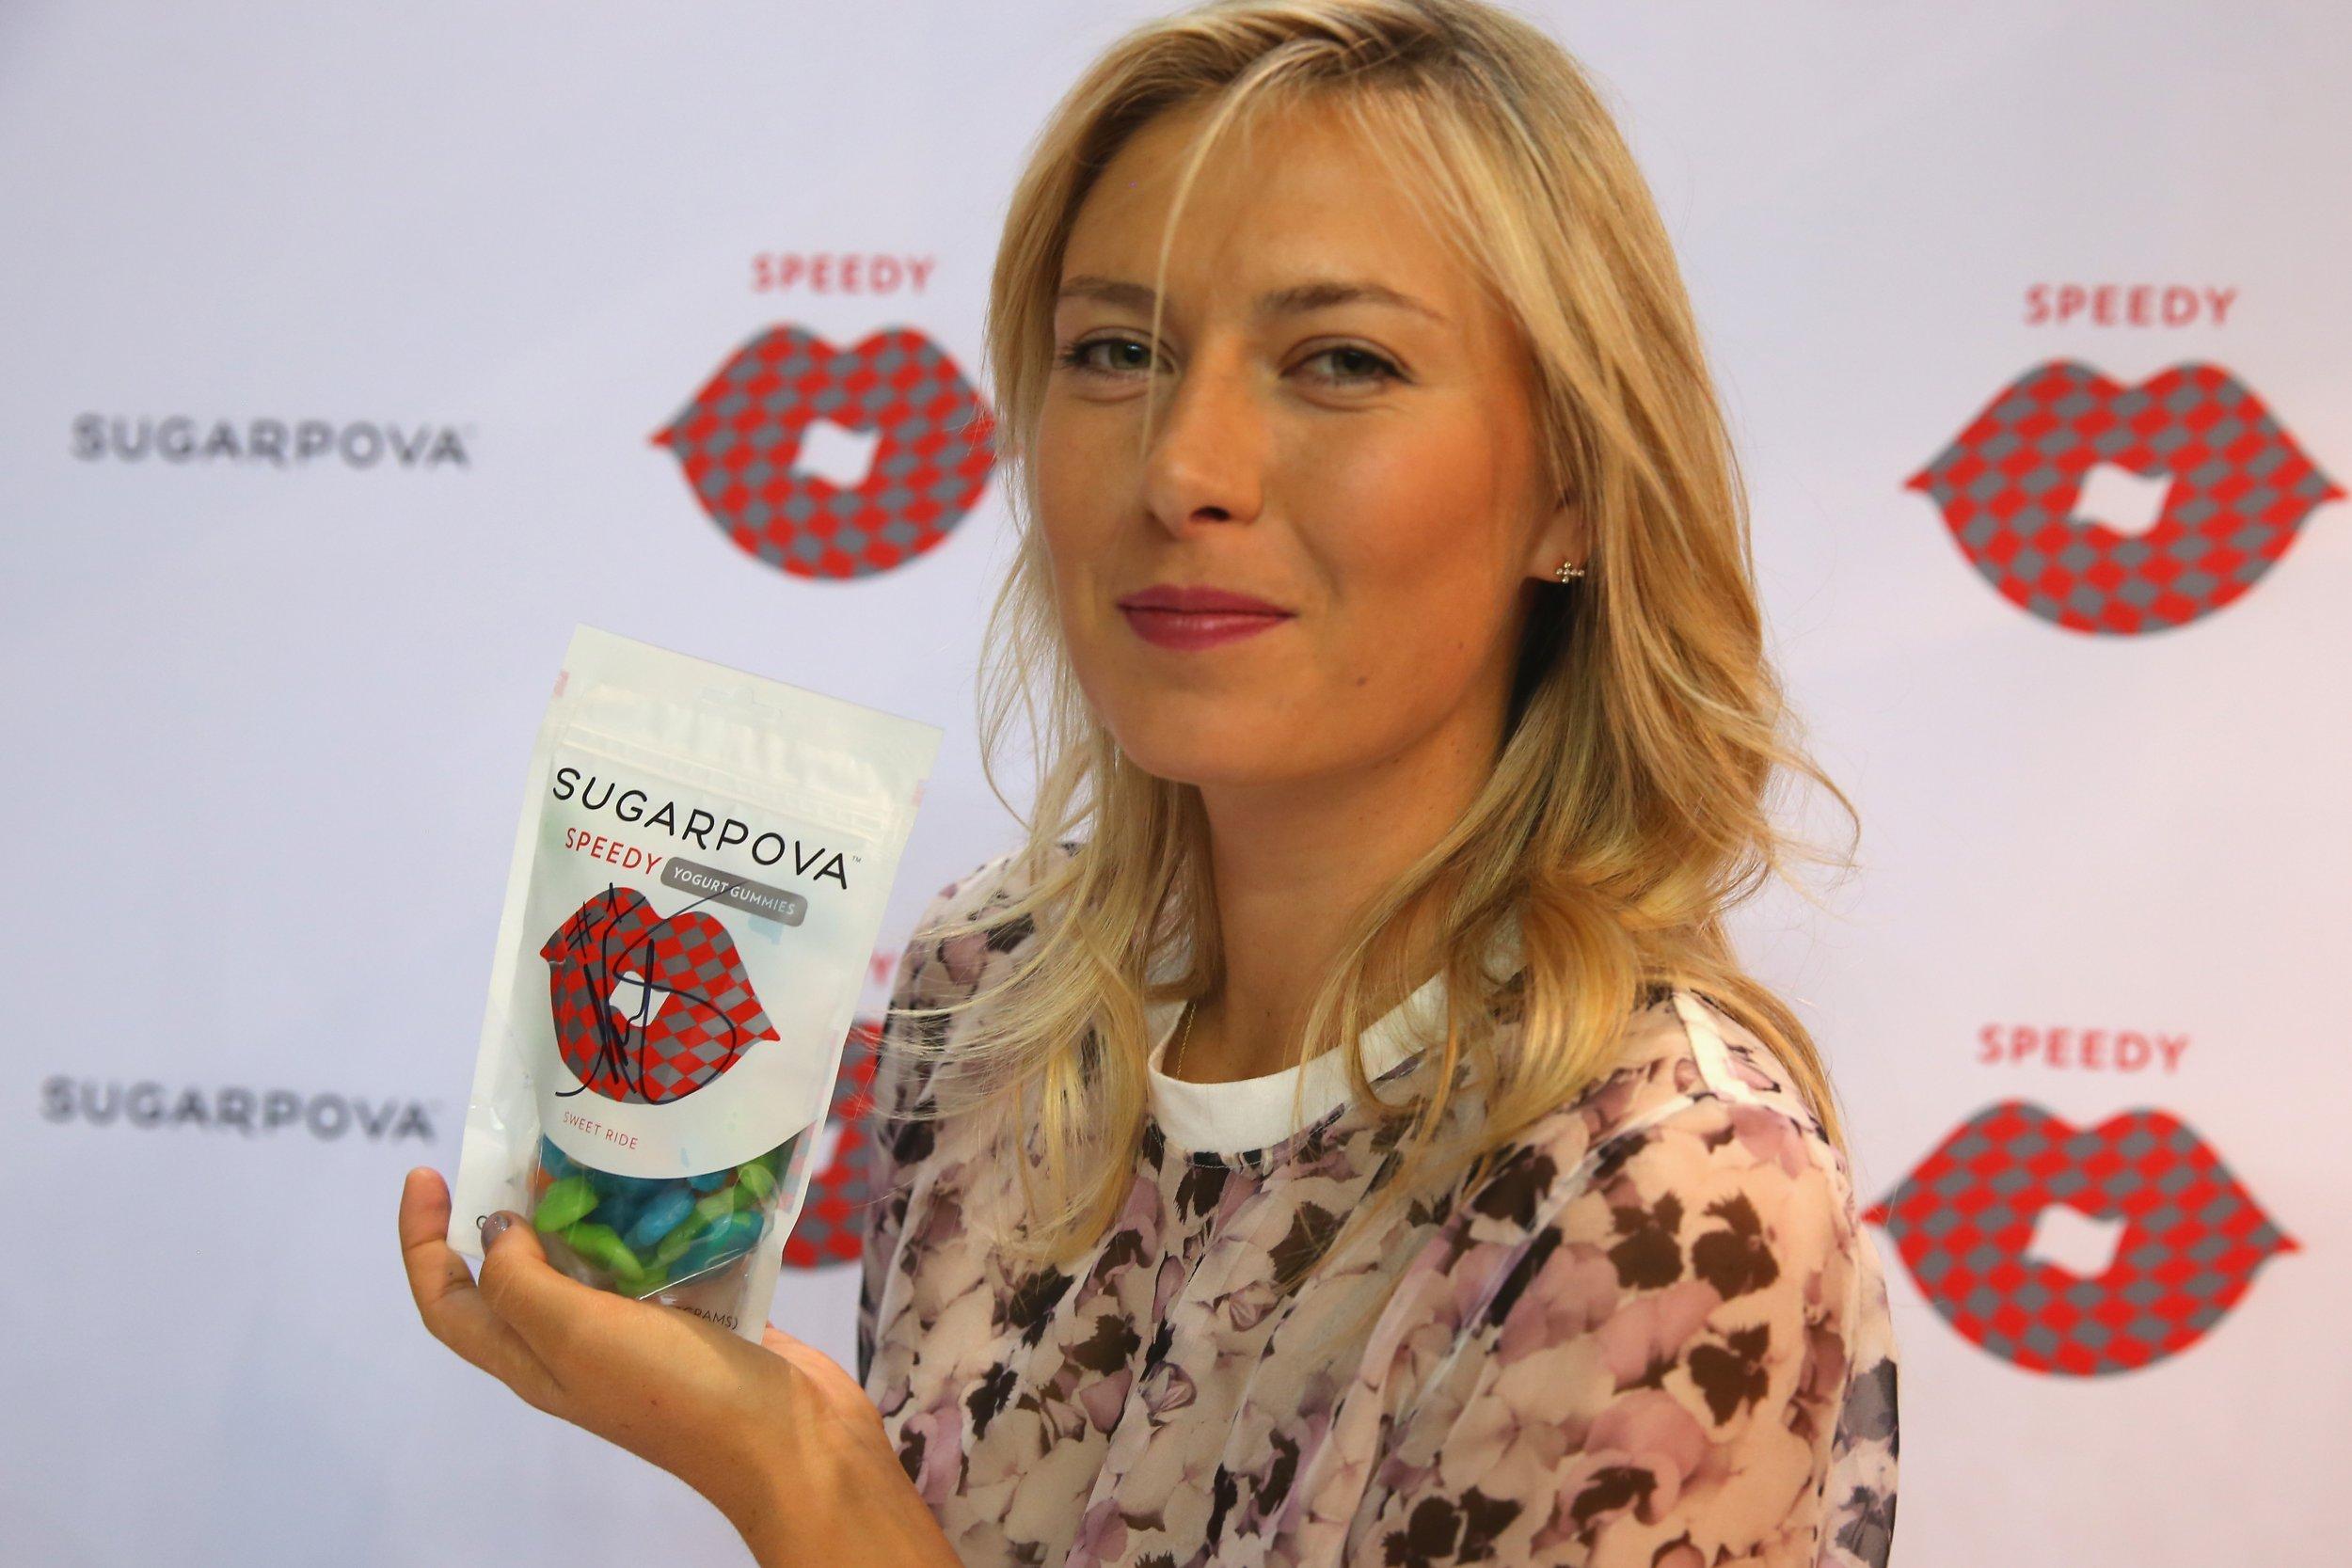 Maria Sharapova Launches Range Of Chocolate